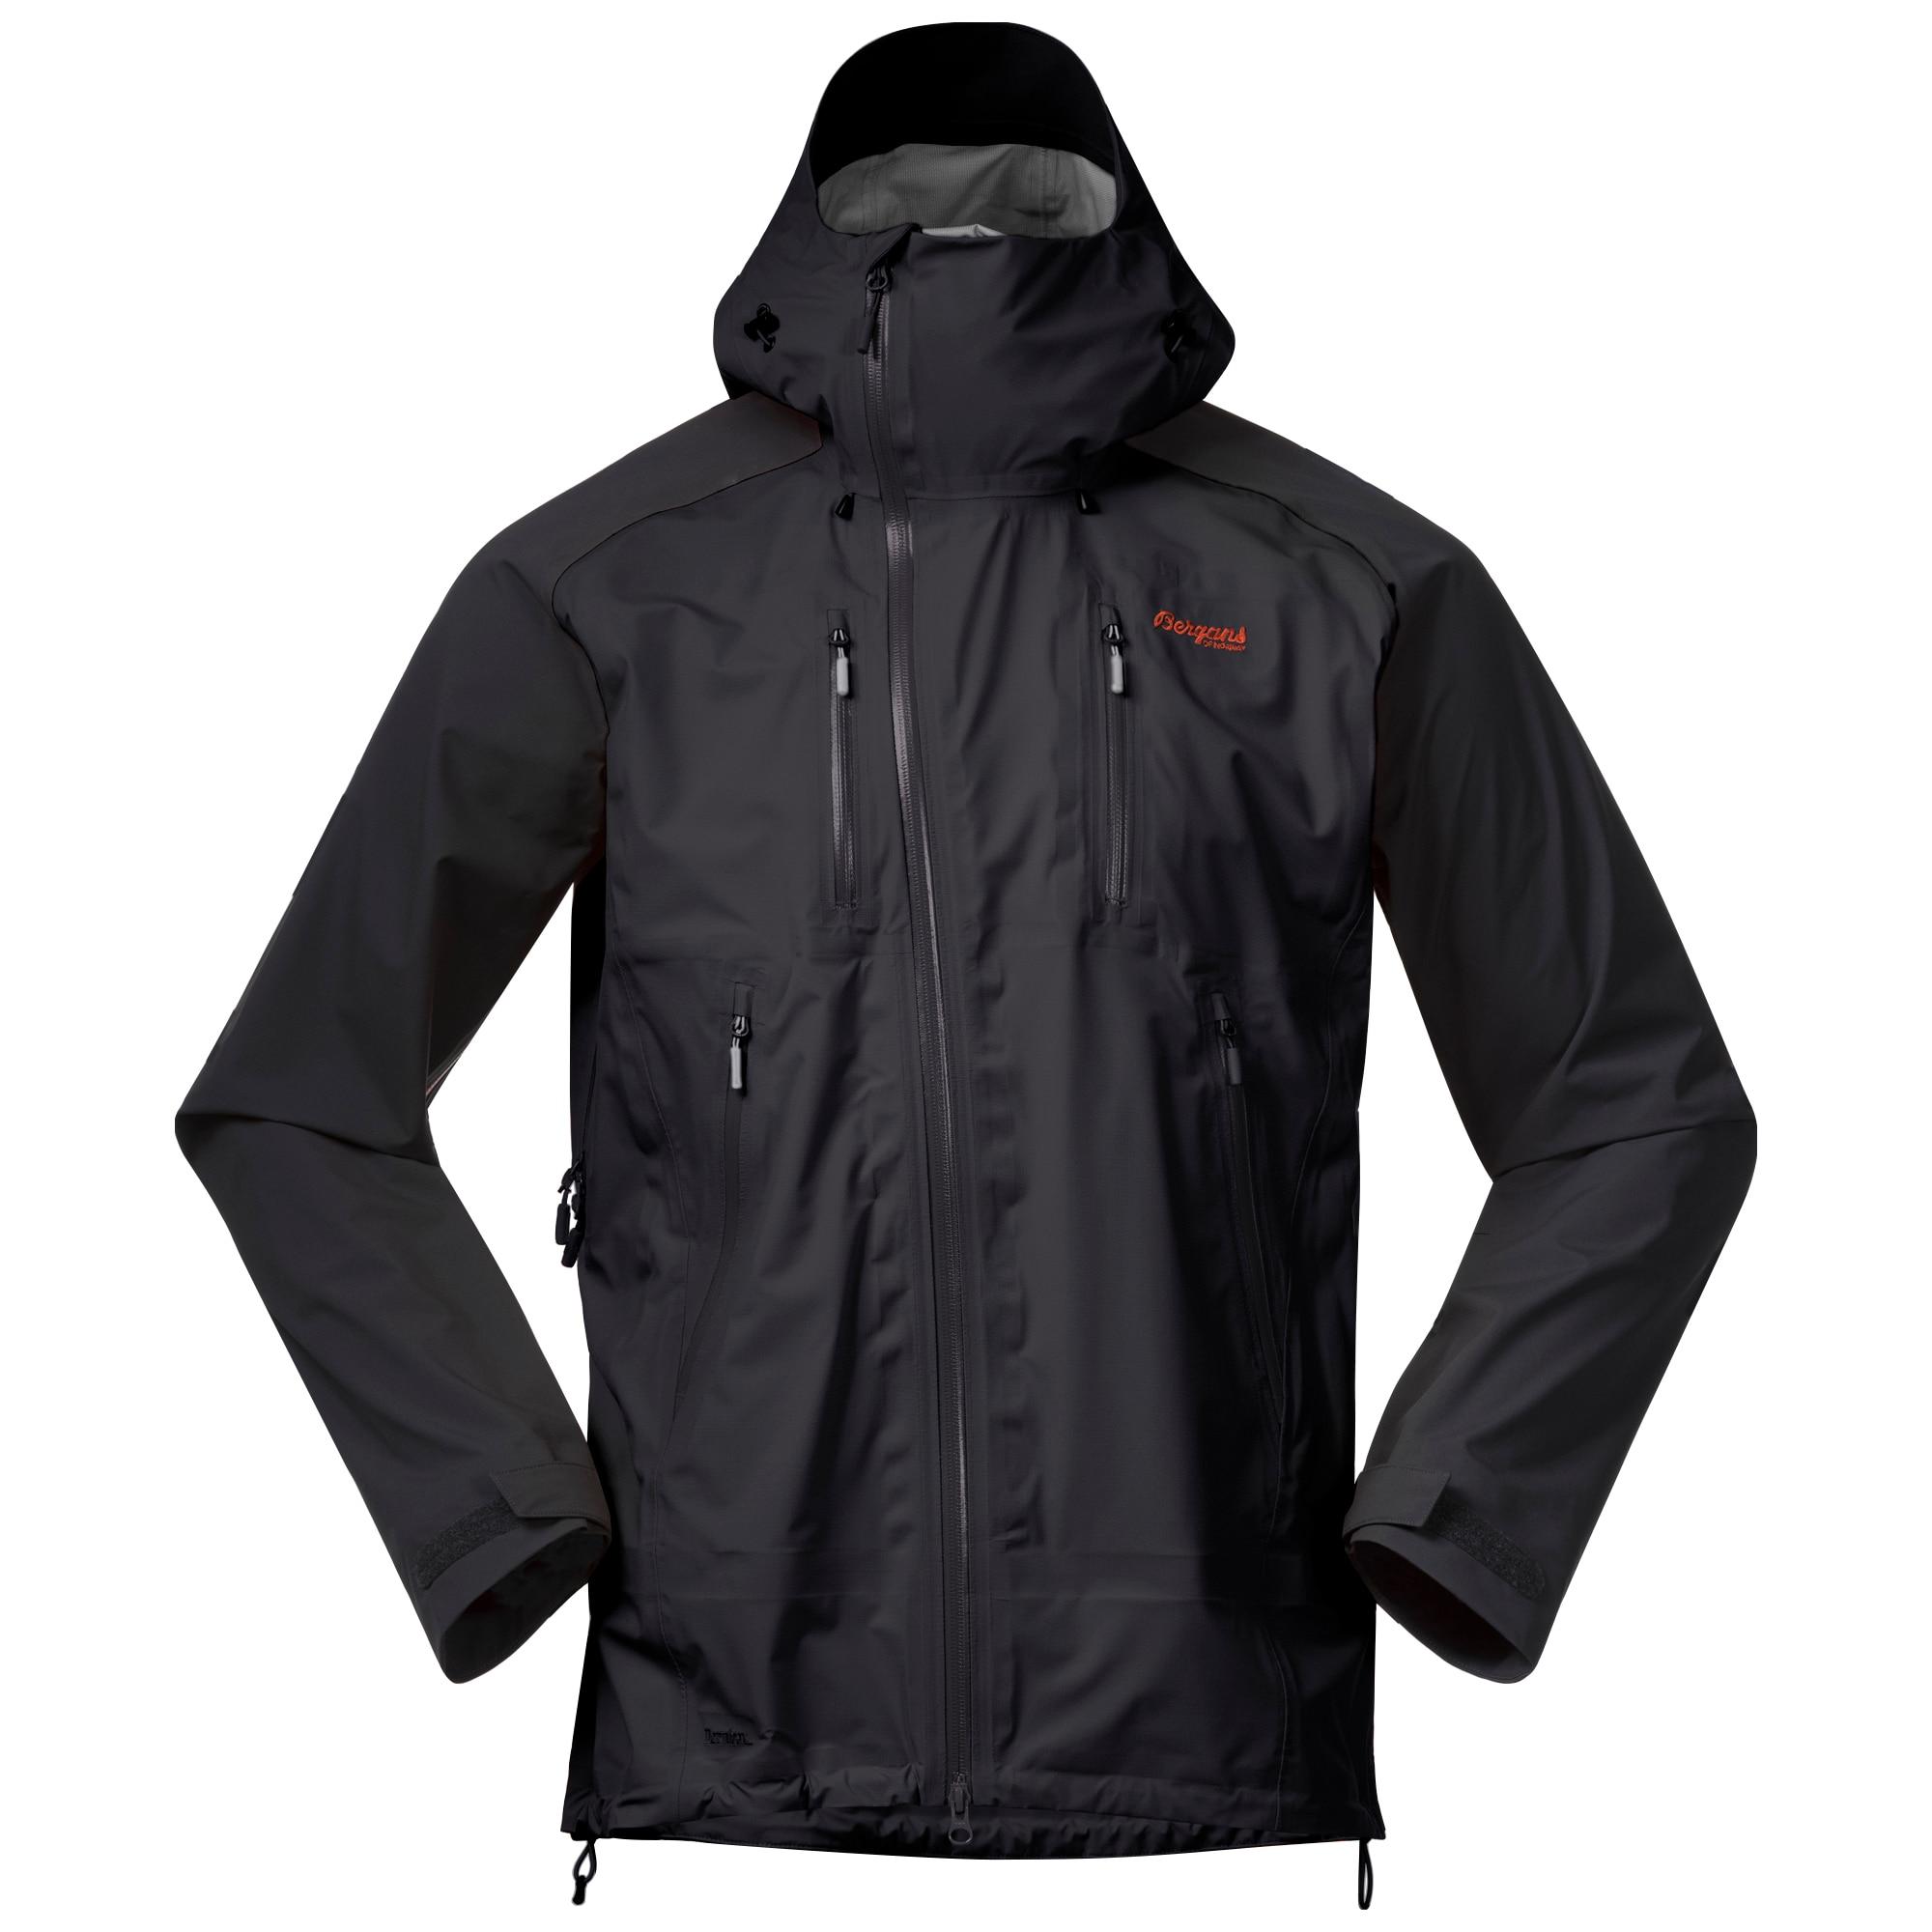 Romsdal 3L Jacket